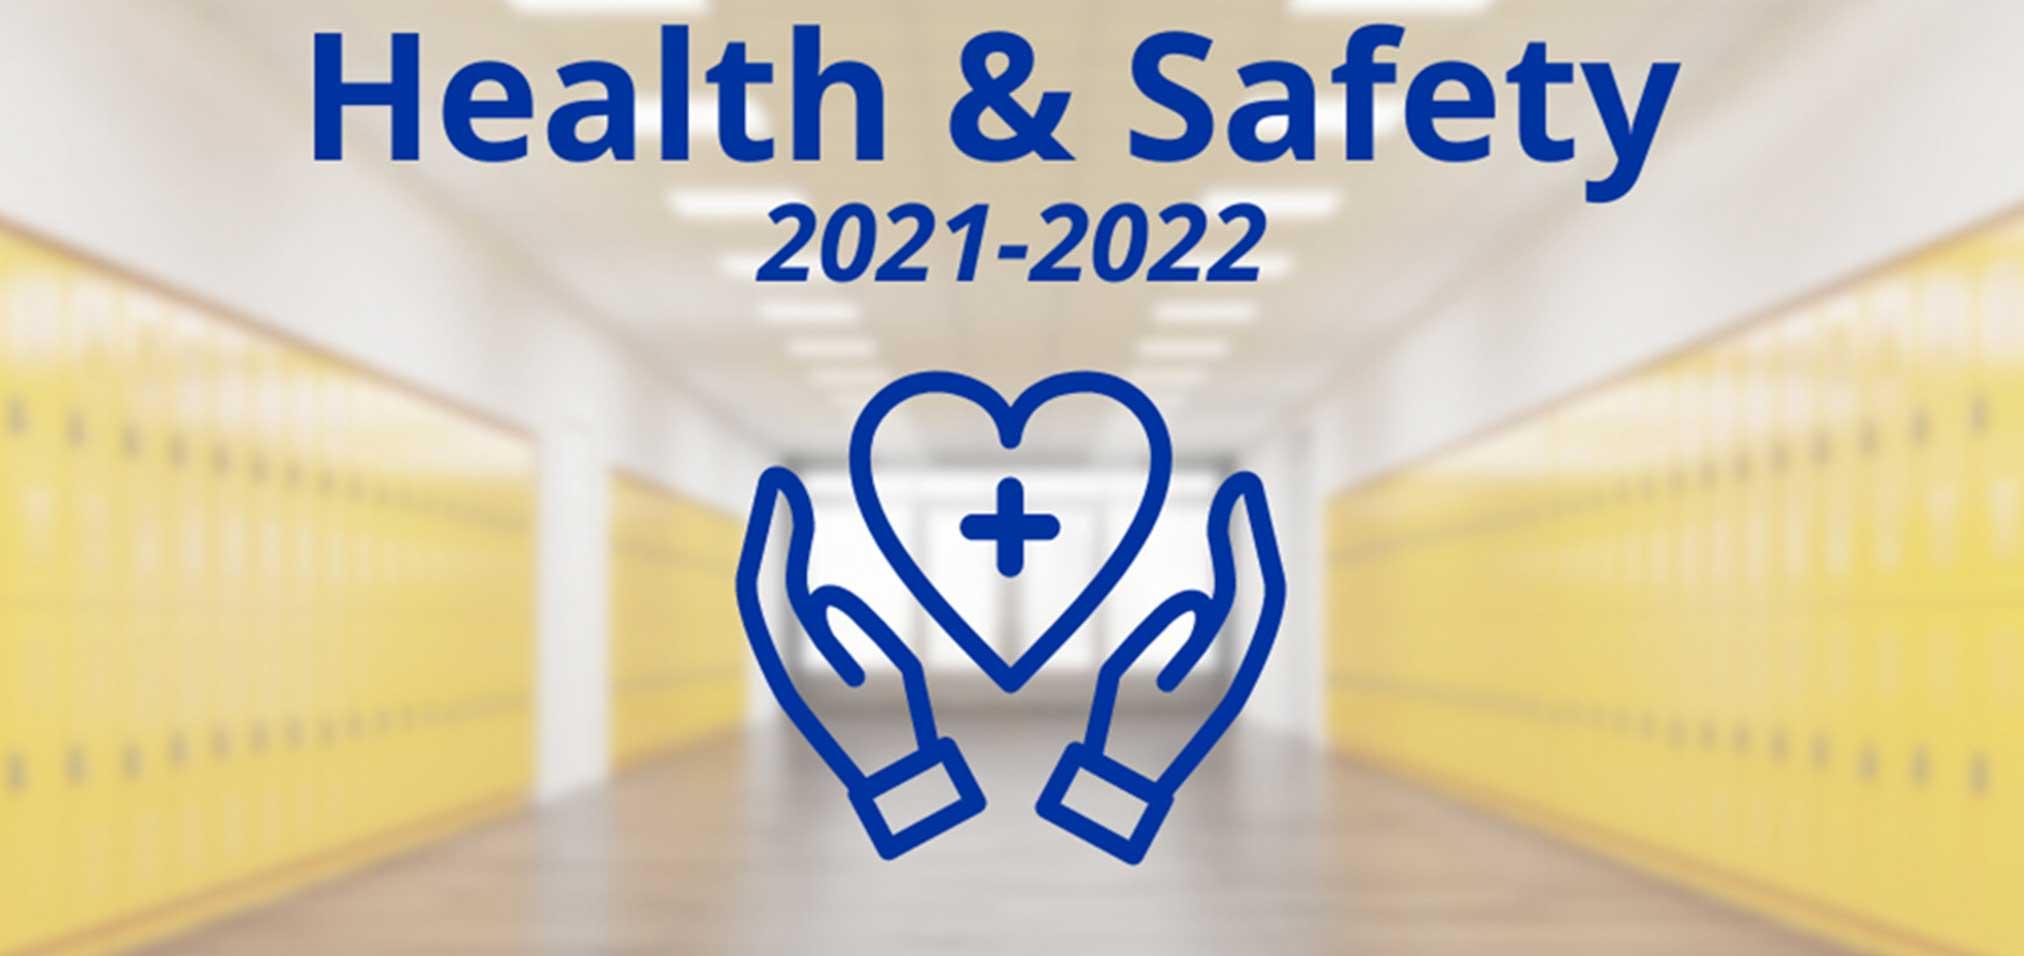 Health & Safety Information – 2021-2022